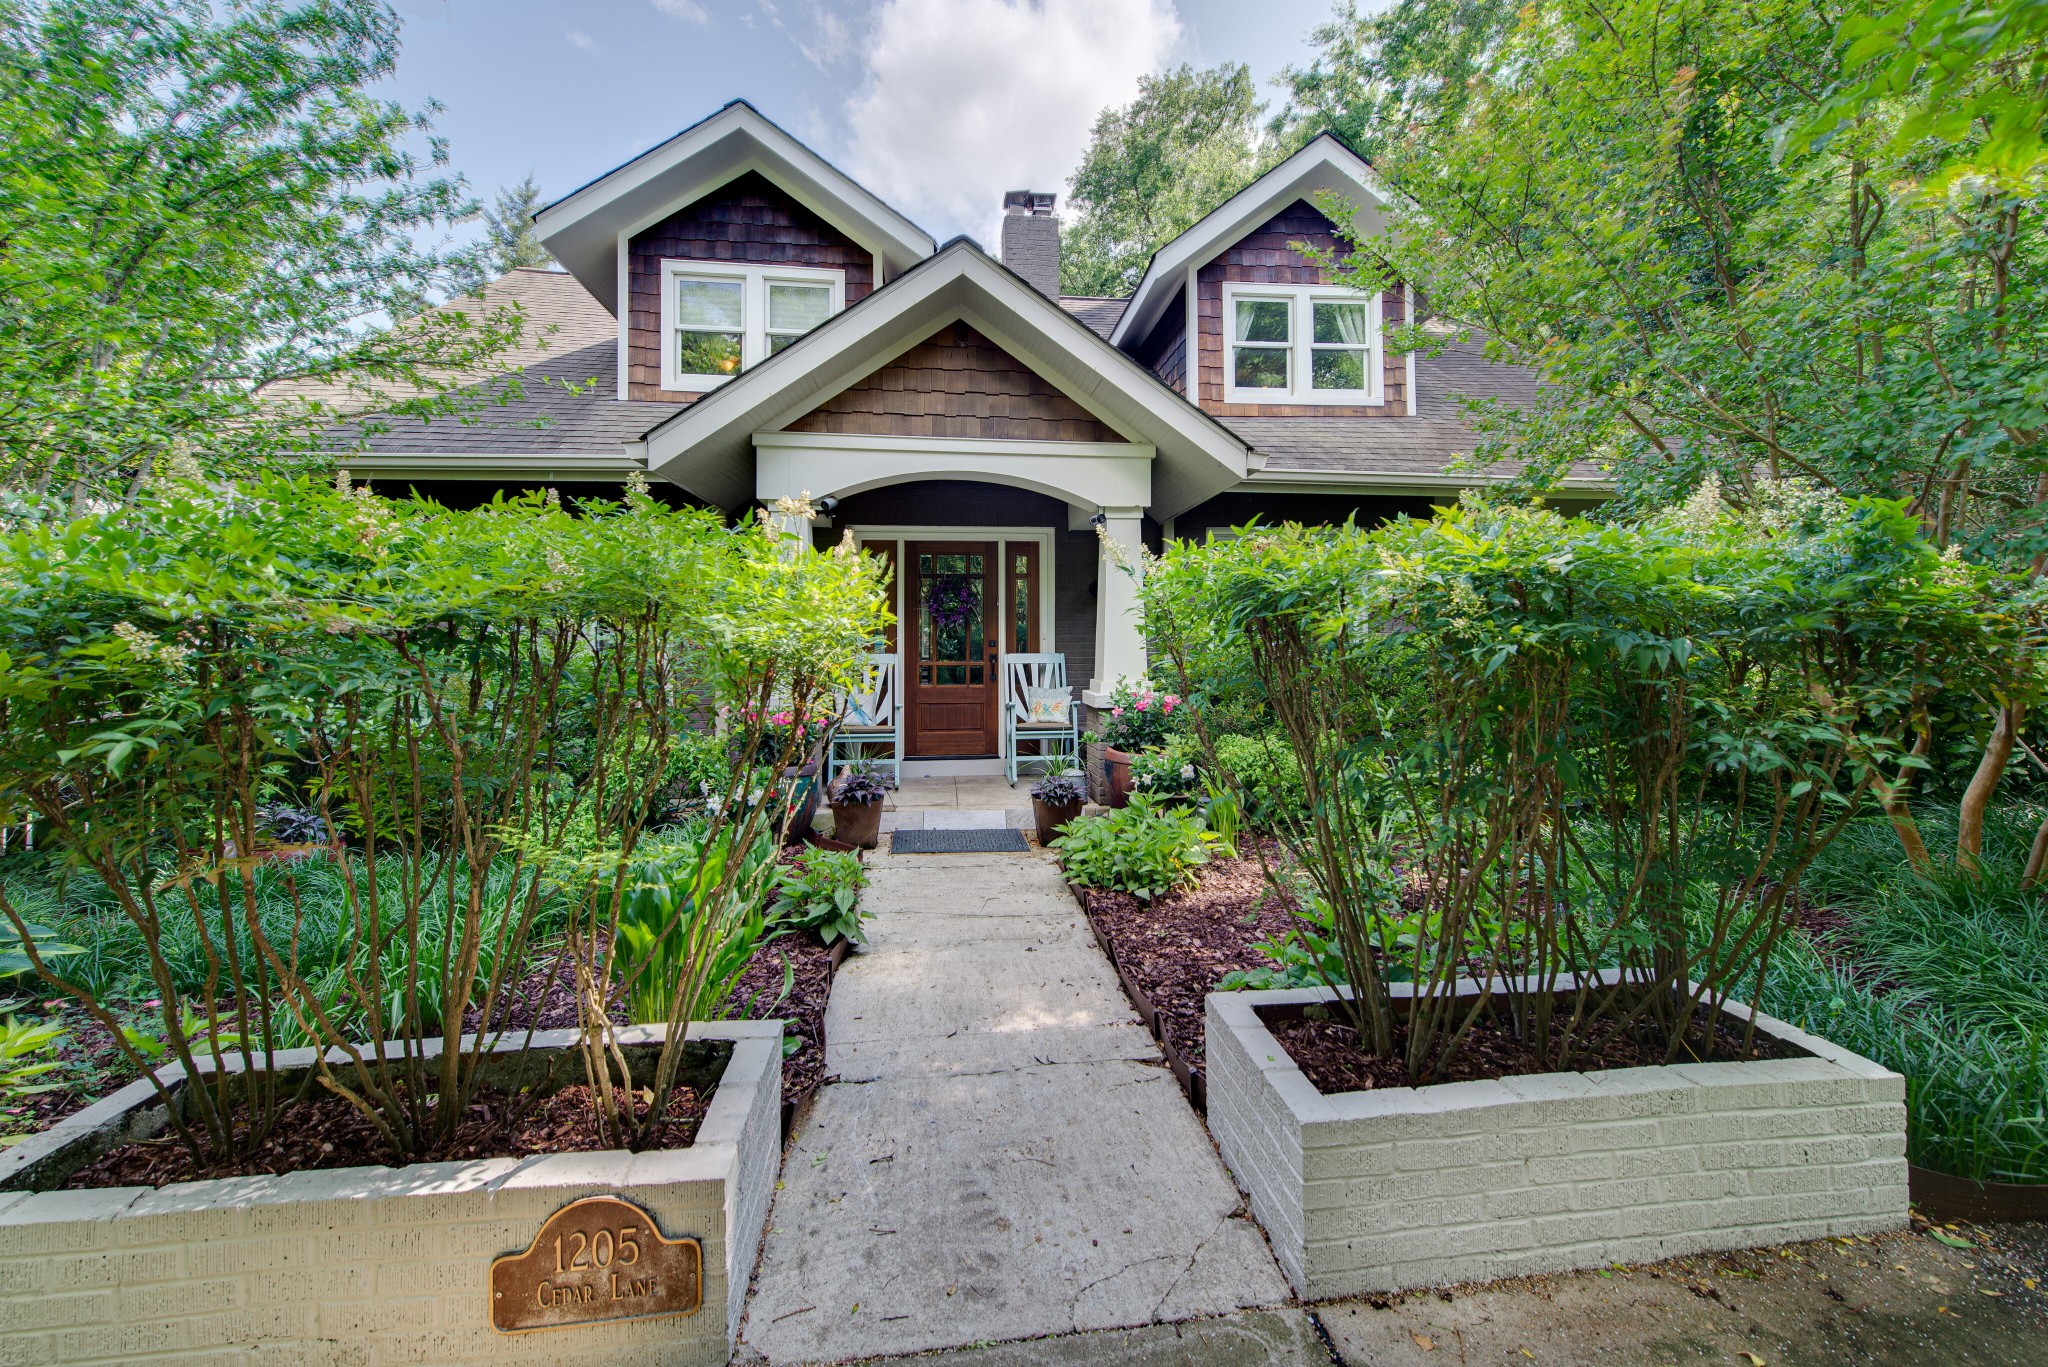 1205 Cedar Ln Property Photo - Nashville, TN real estate listing